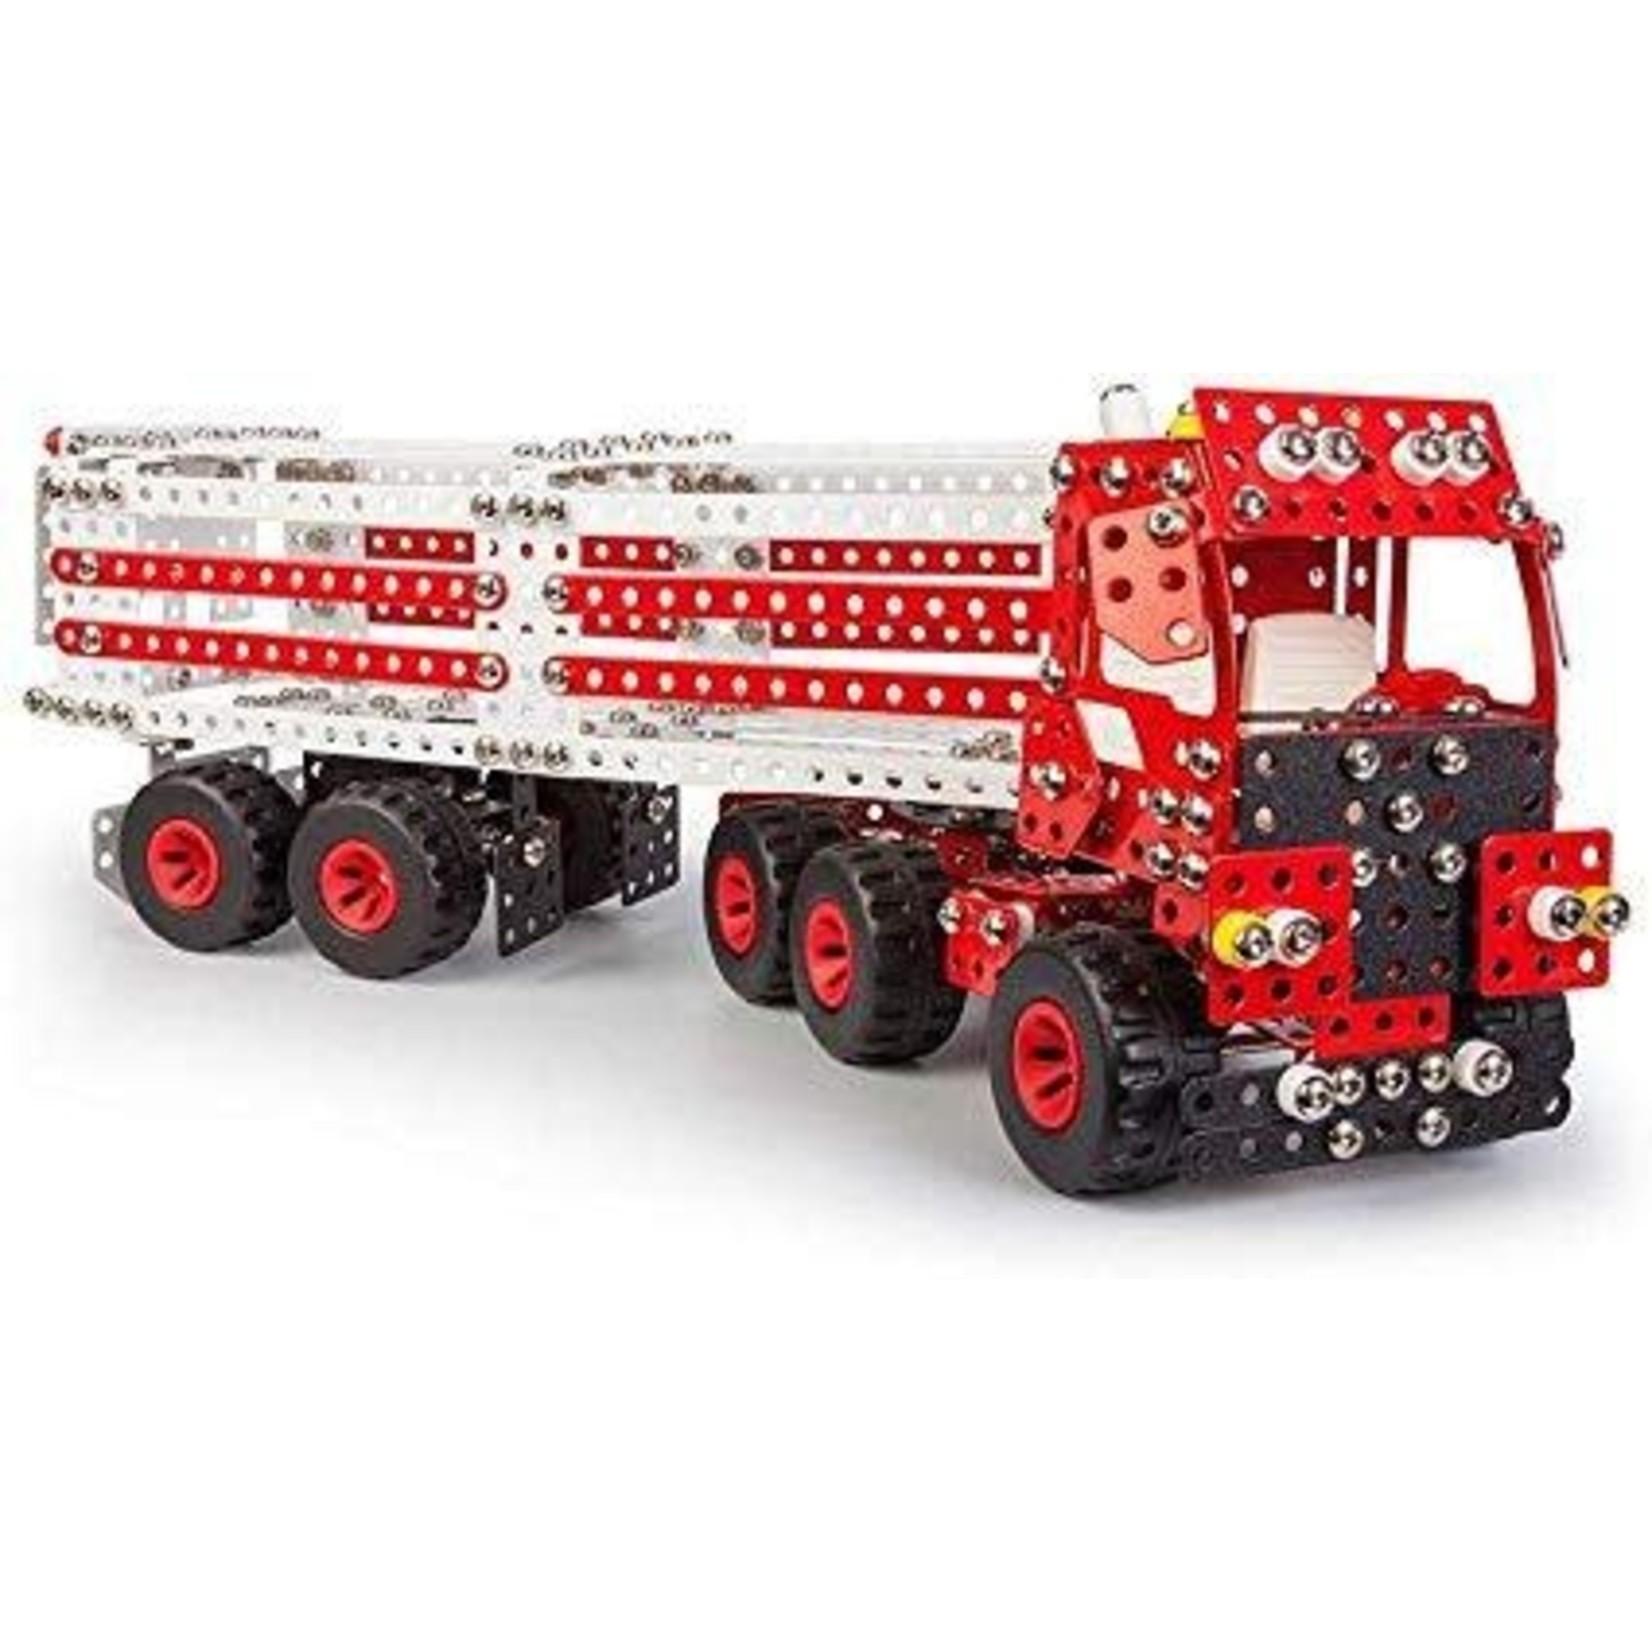 Alexander Constructor Pro: Premium Truck